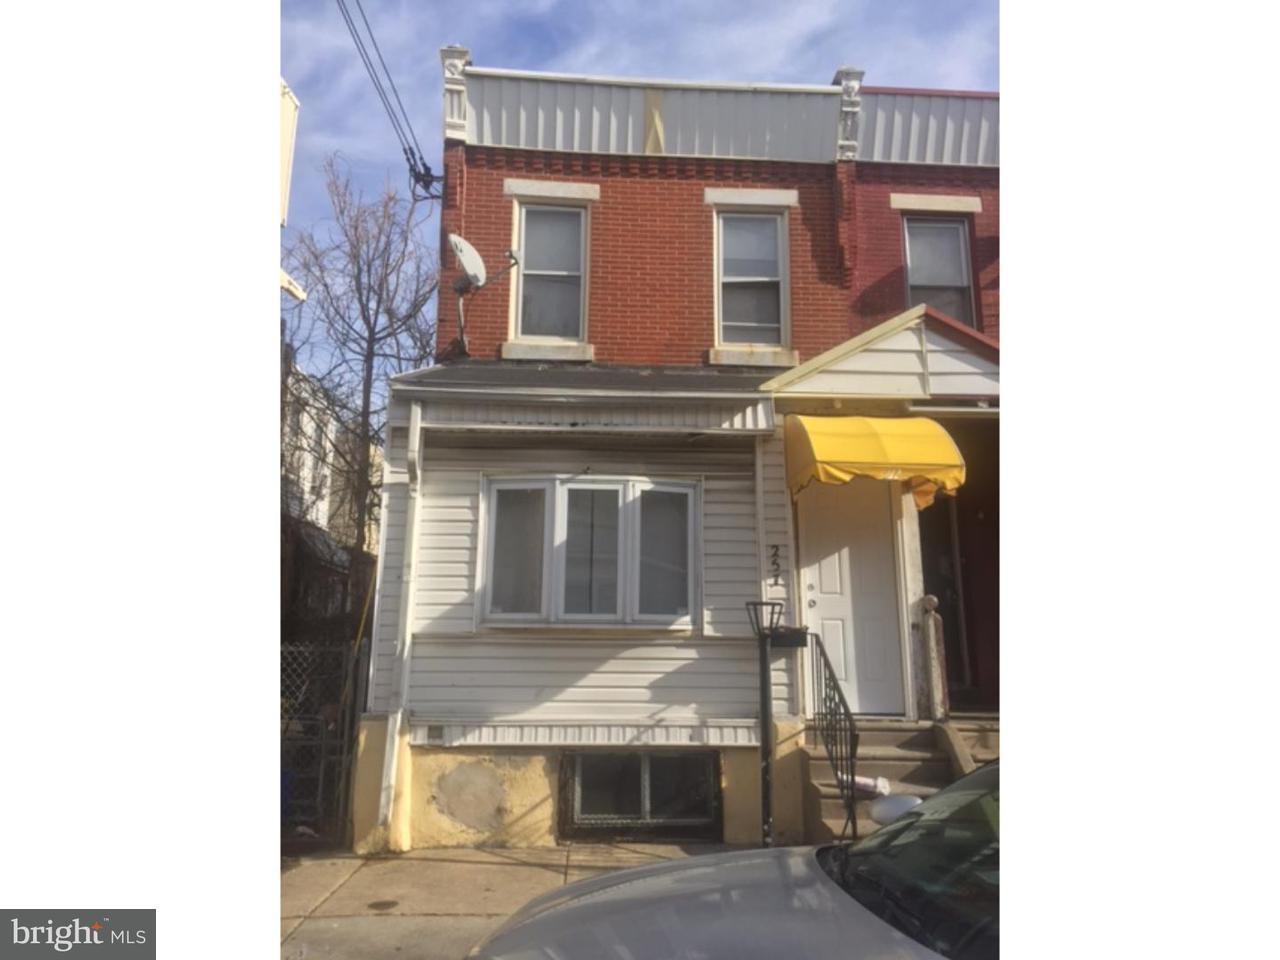 257 N Hobart Philadelphia , PA 19139